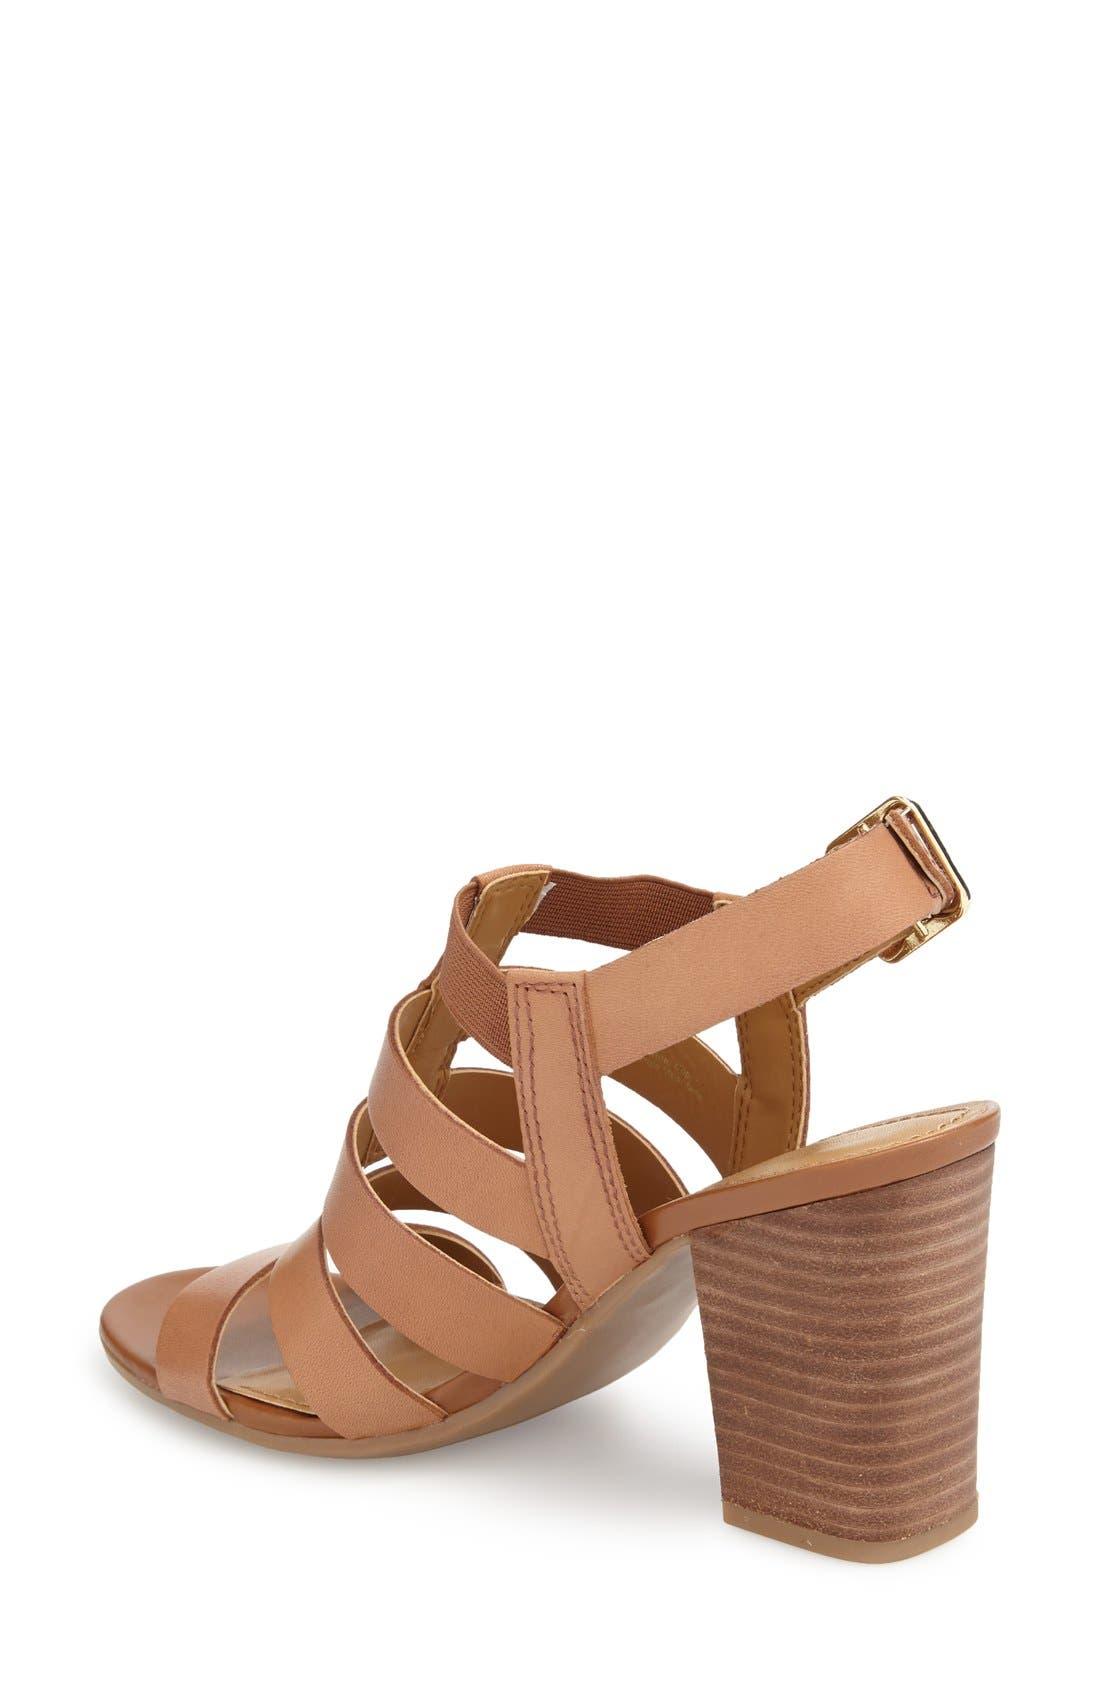 Alternate Image 2  - Franco Sarto 'Montage' Leather Sandal (Women)